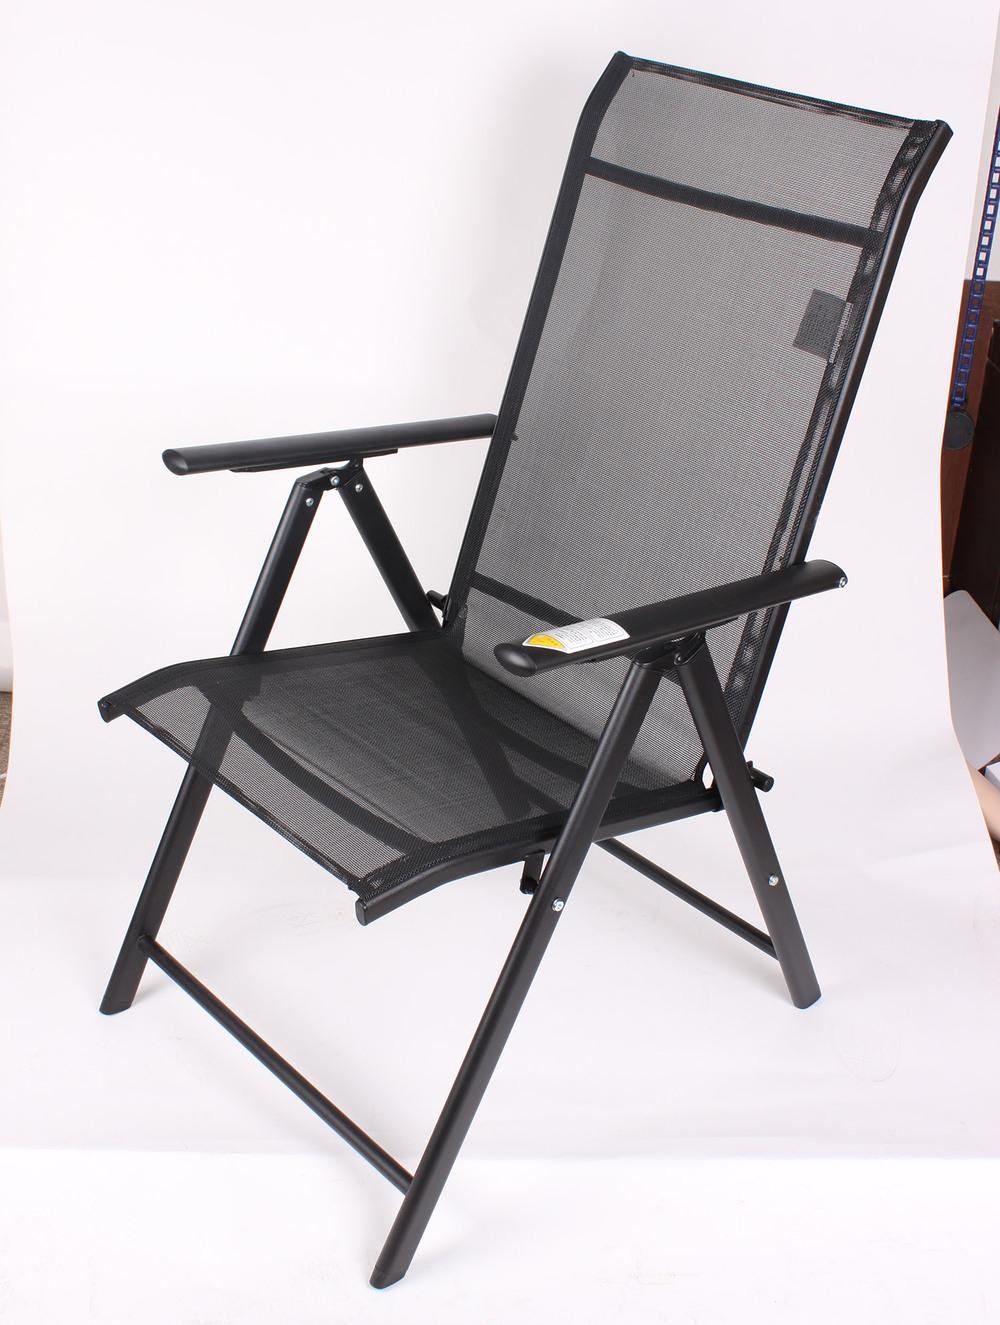 Massage Cushion Chair Folding Aluminum Seven Position